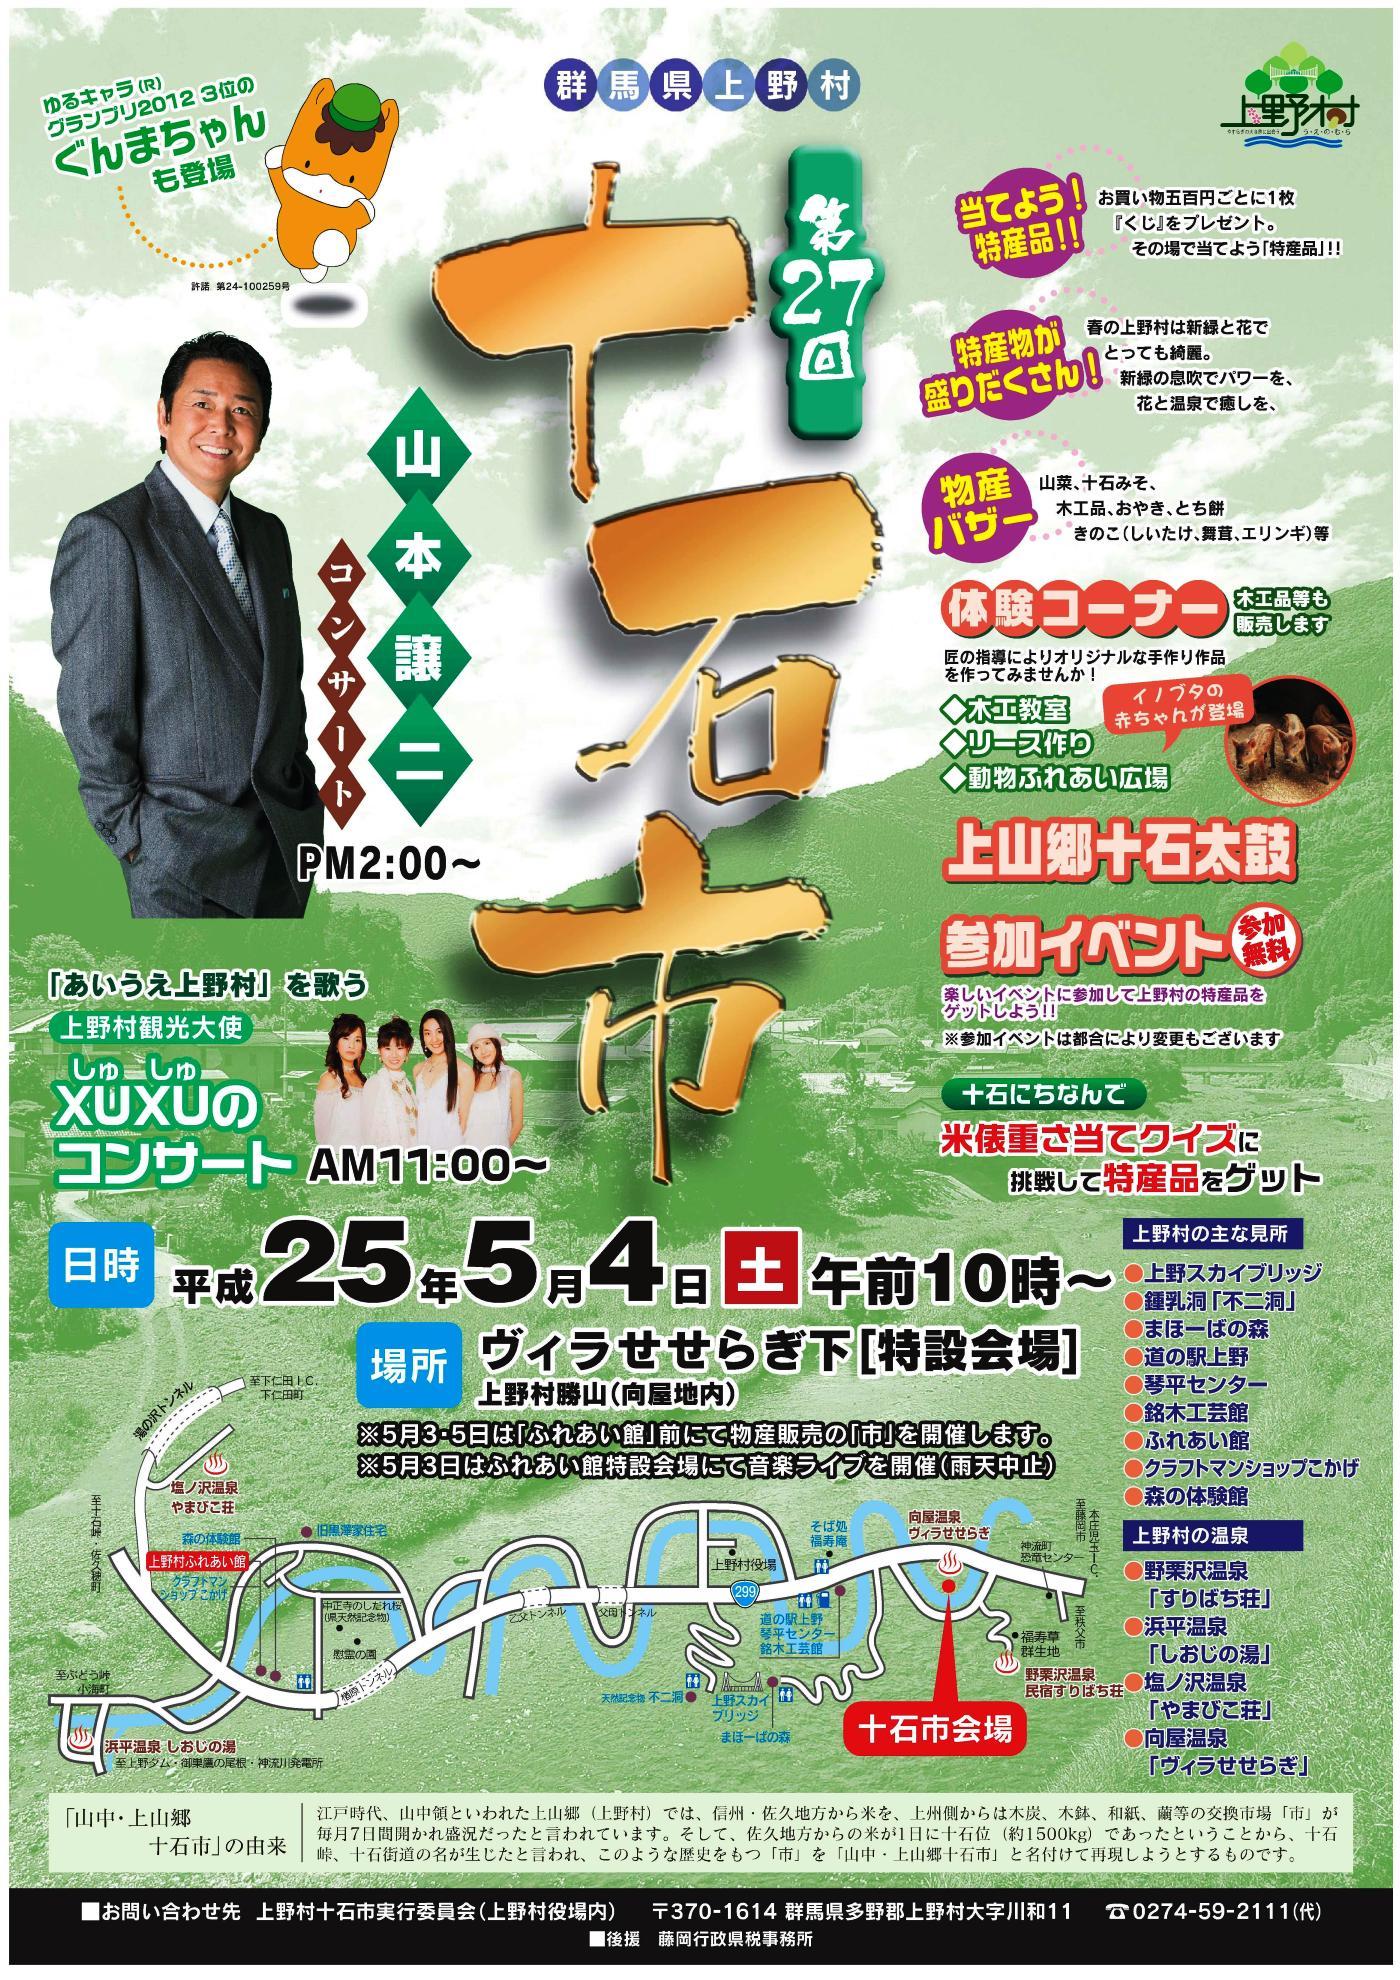 http://www.uenomura.ne.jp/blog/photonews2/01.JPG